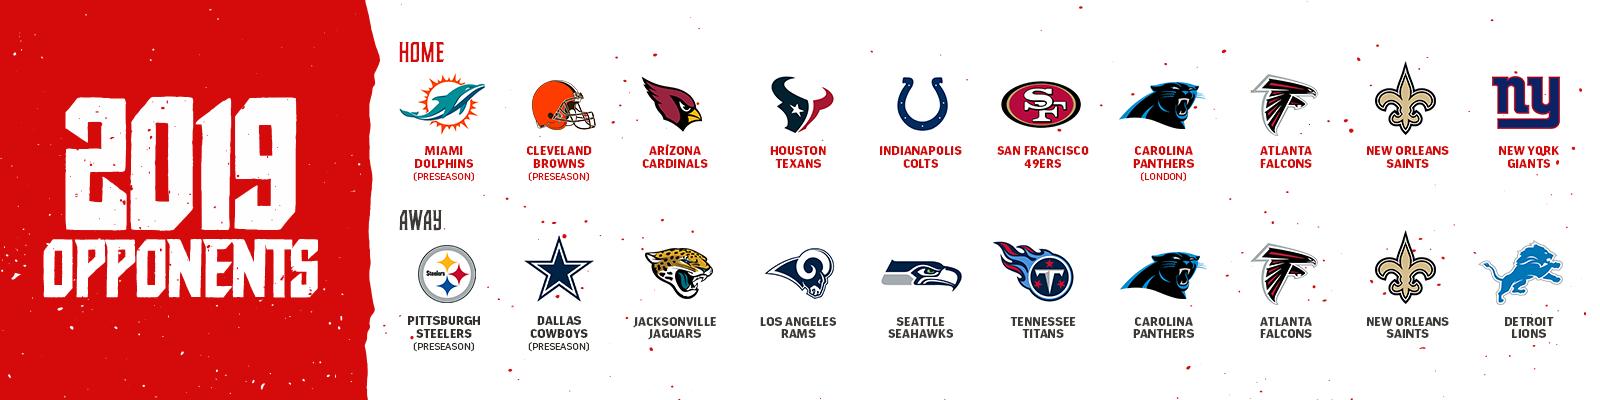 Opponents Schedule-2019